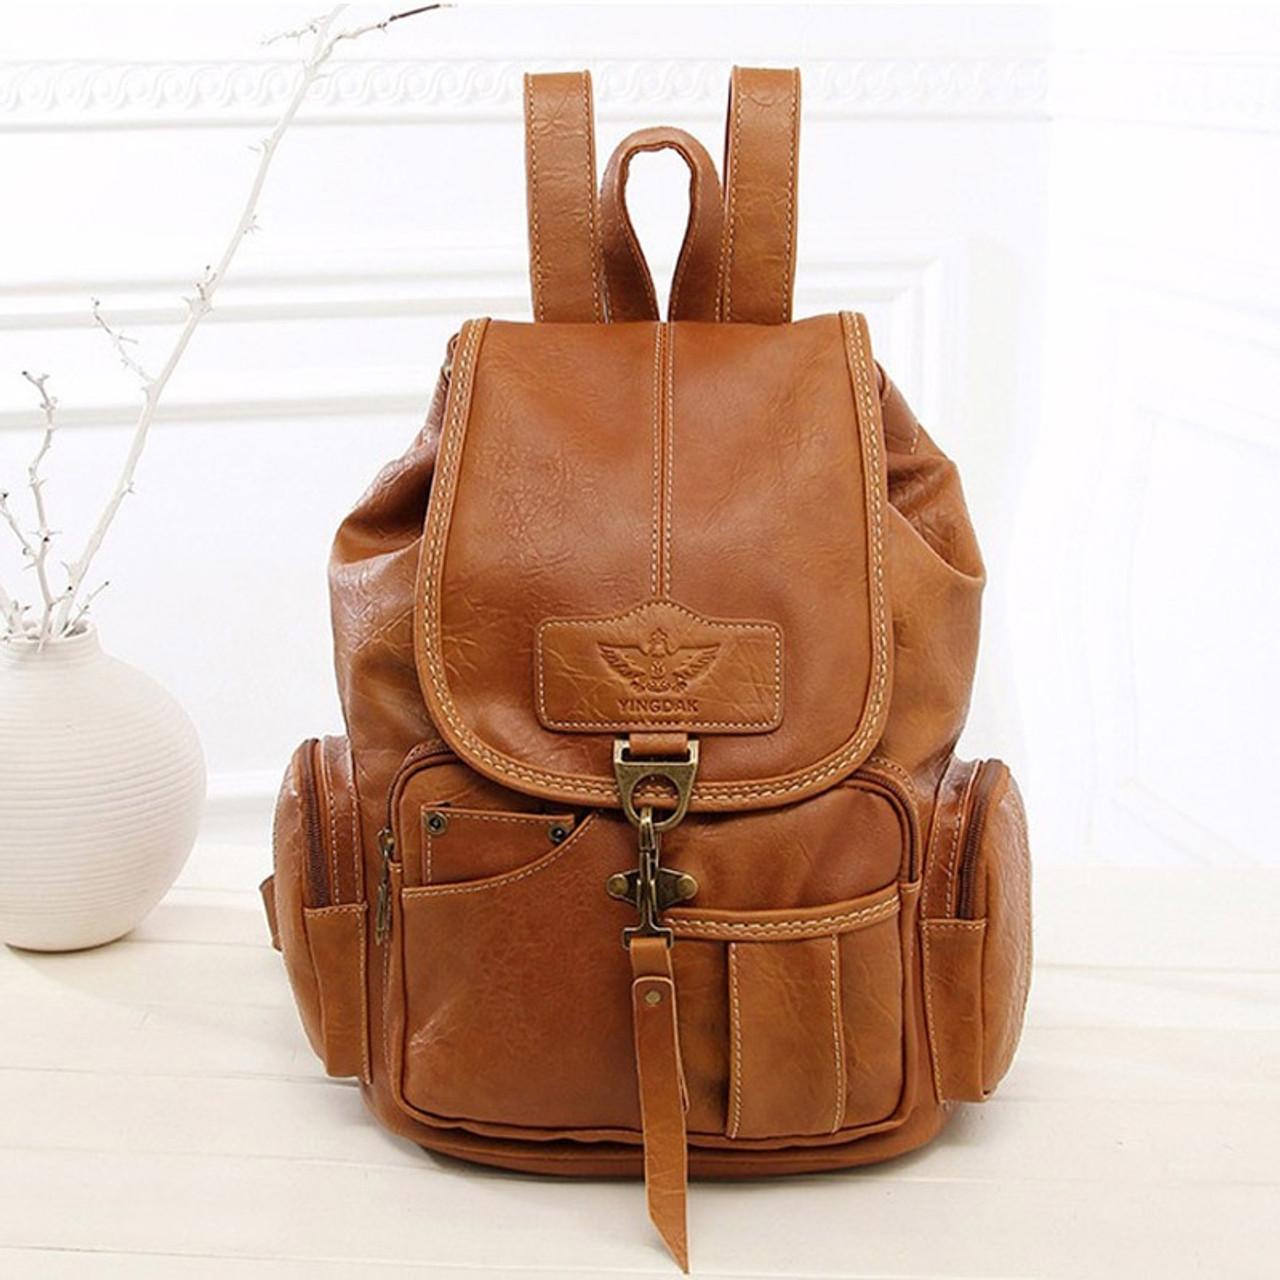 c28b6ace23 ... Vintage Women Backpack for Teenage Girls School Bags Large Drawstring  Backpacks High Quality PU Leather Black ...